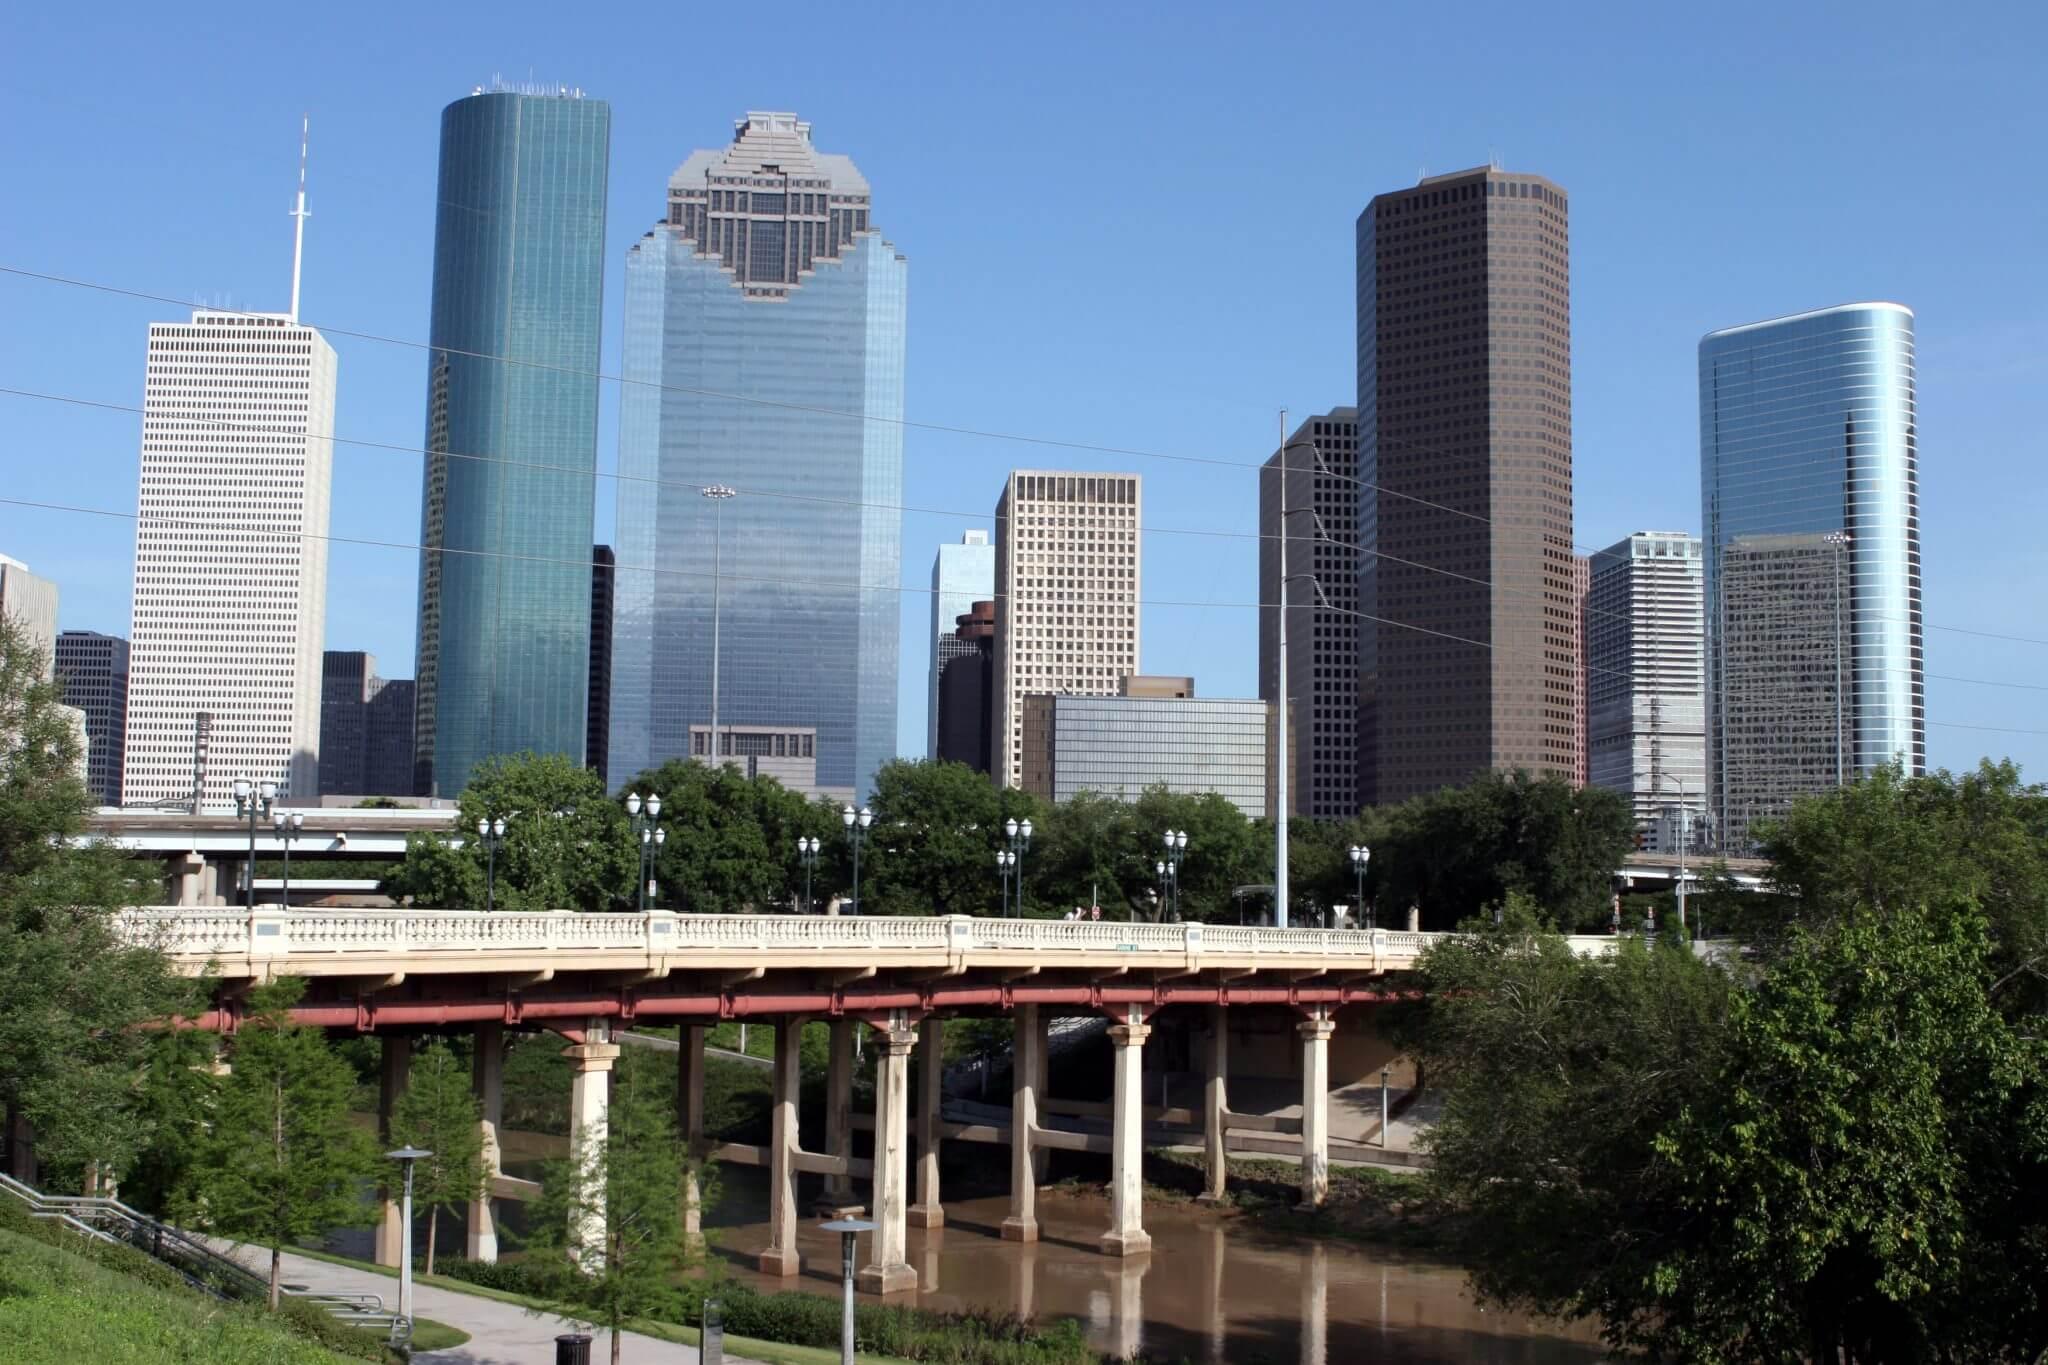 Commercial Property Appraisals in San Antonio